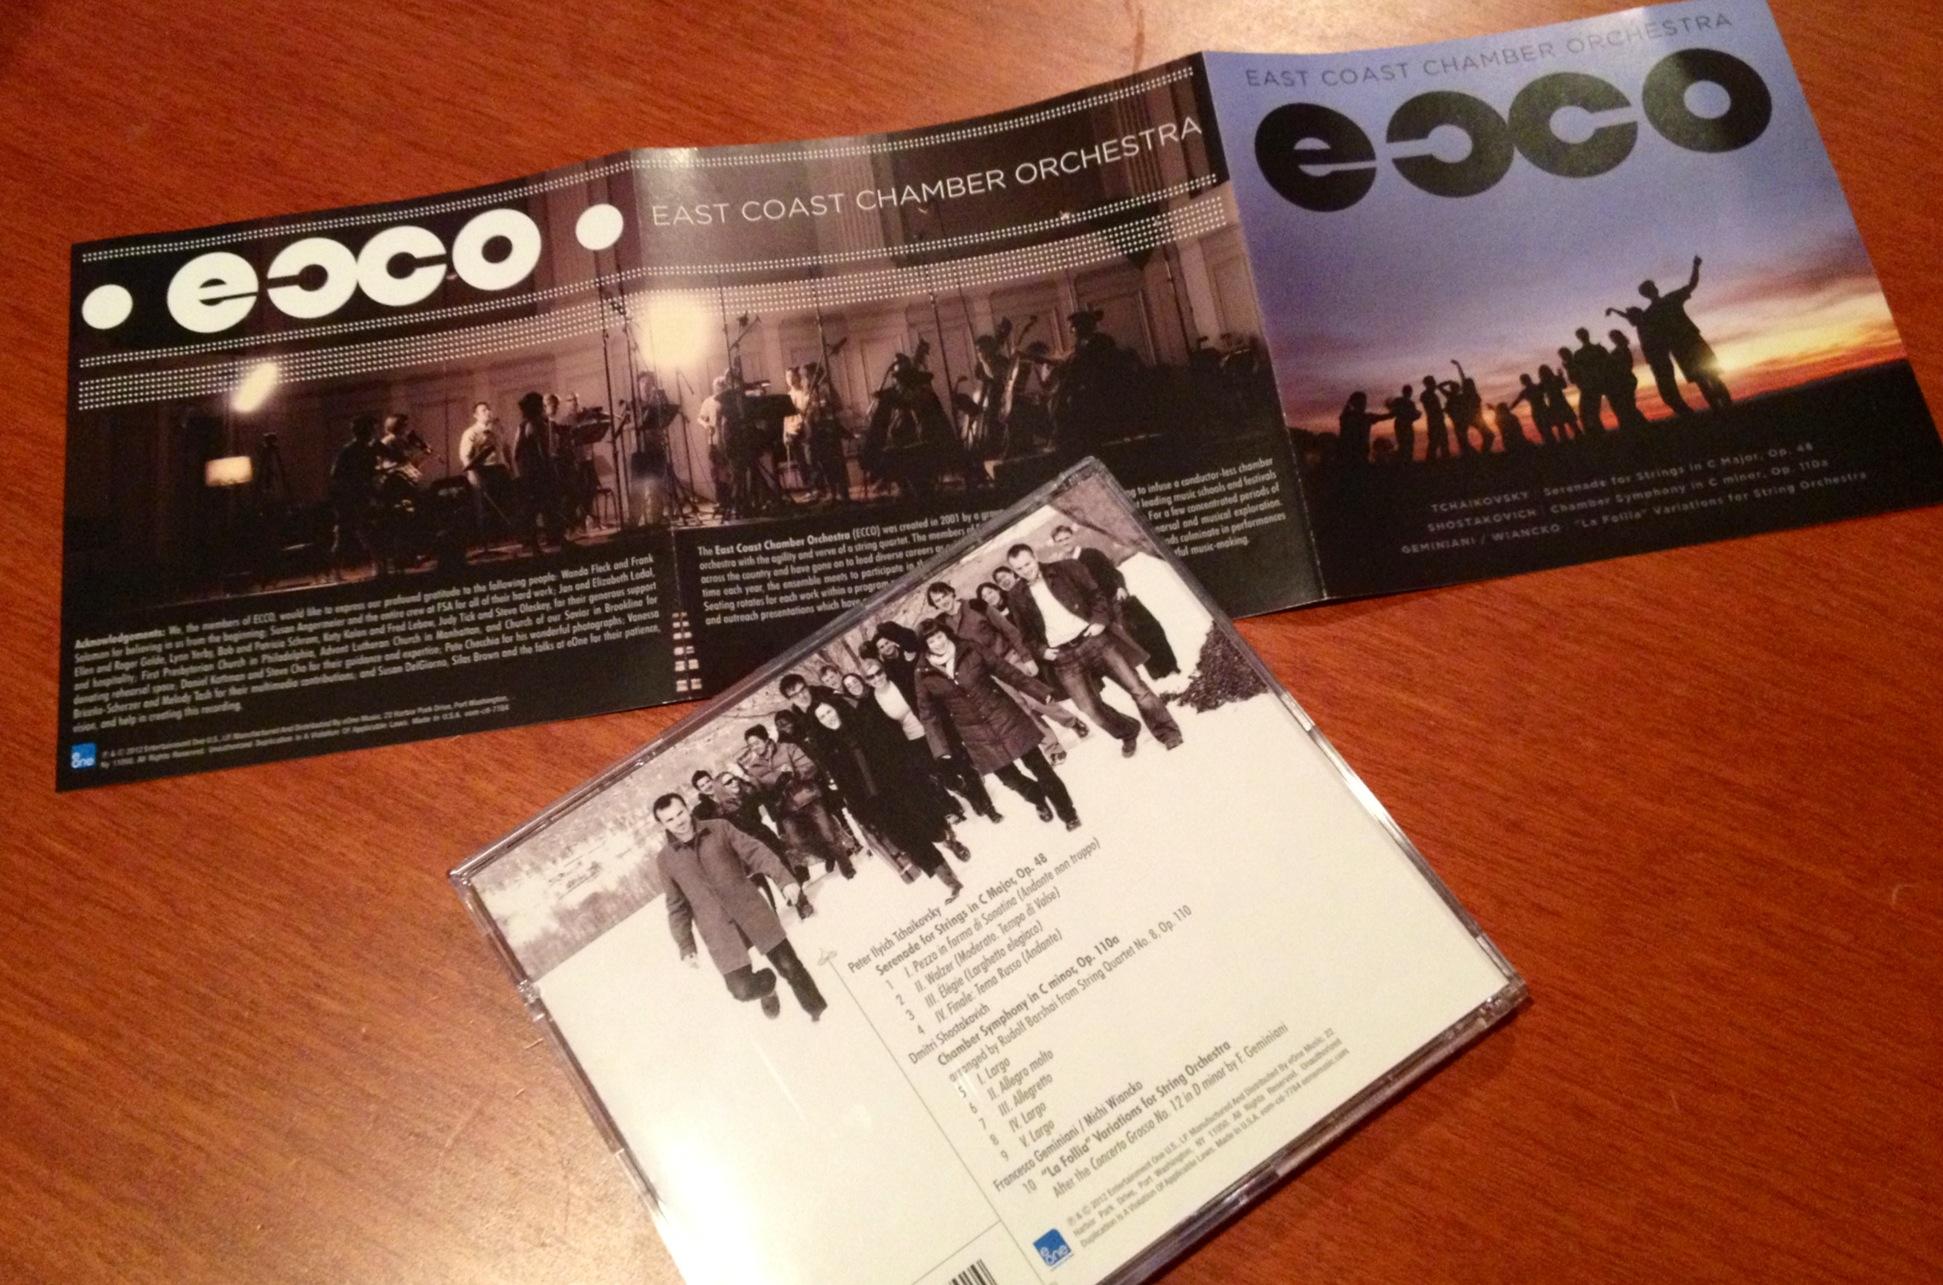 ECCOcd1